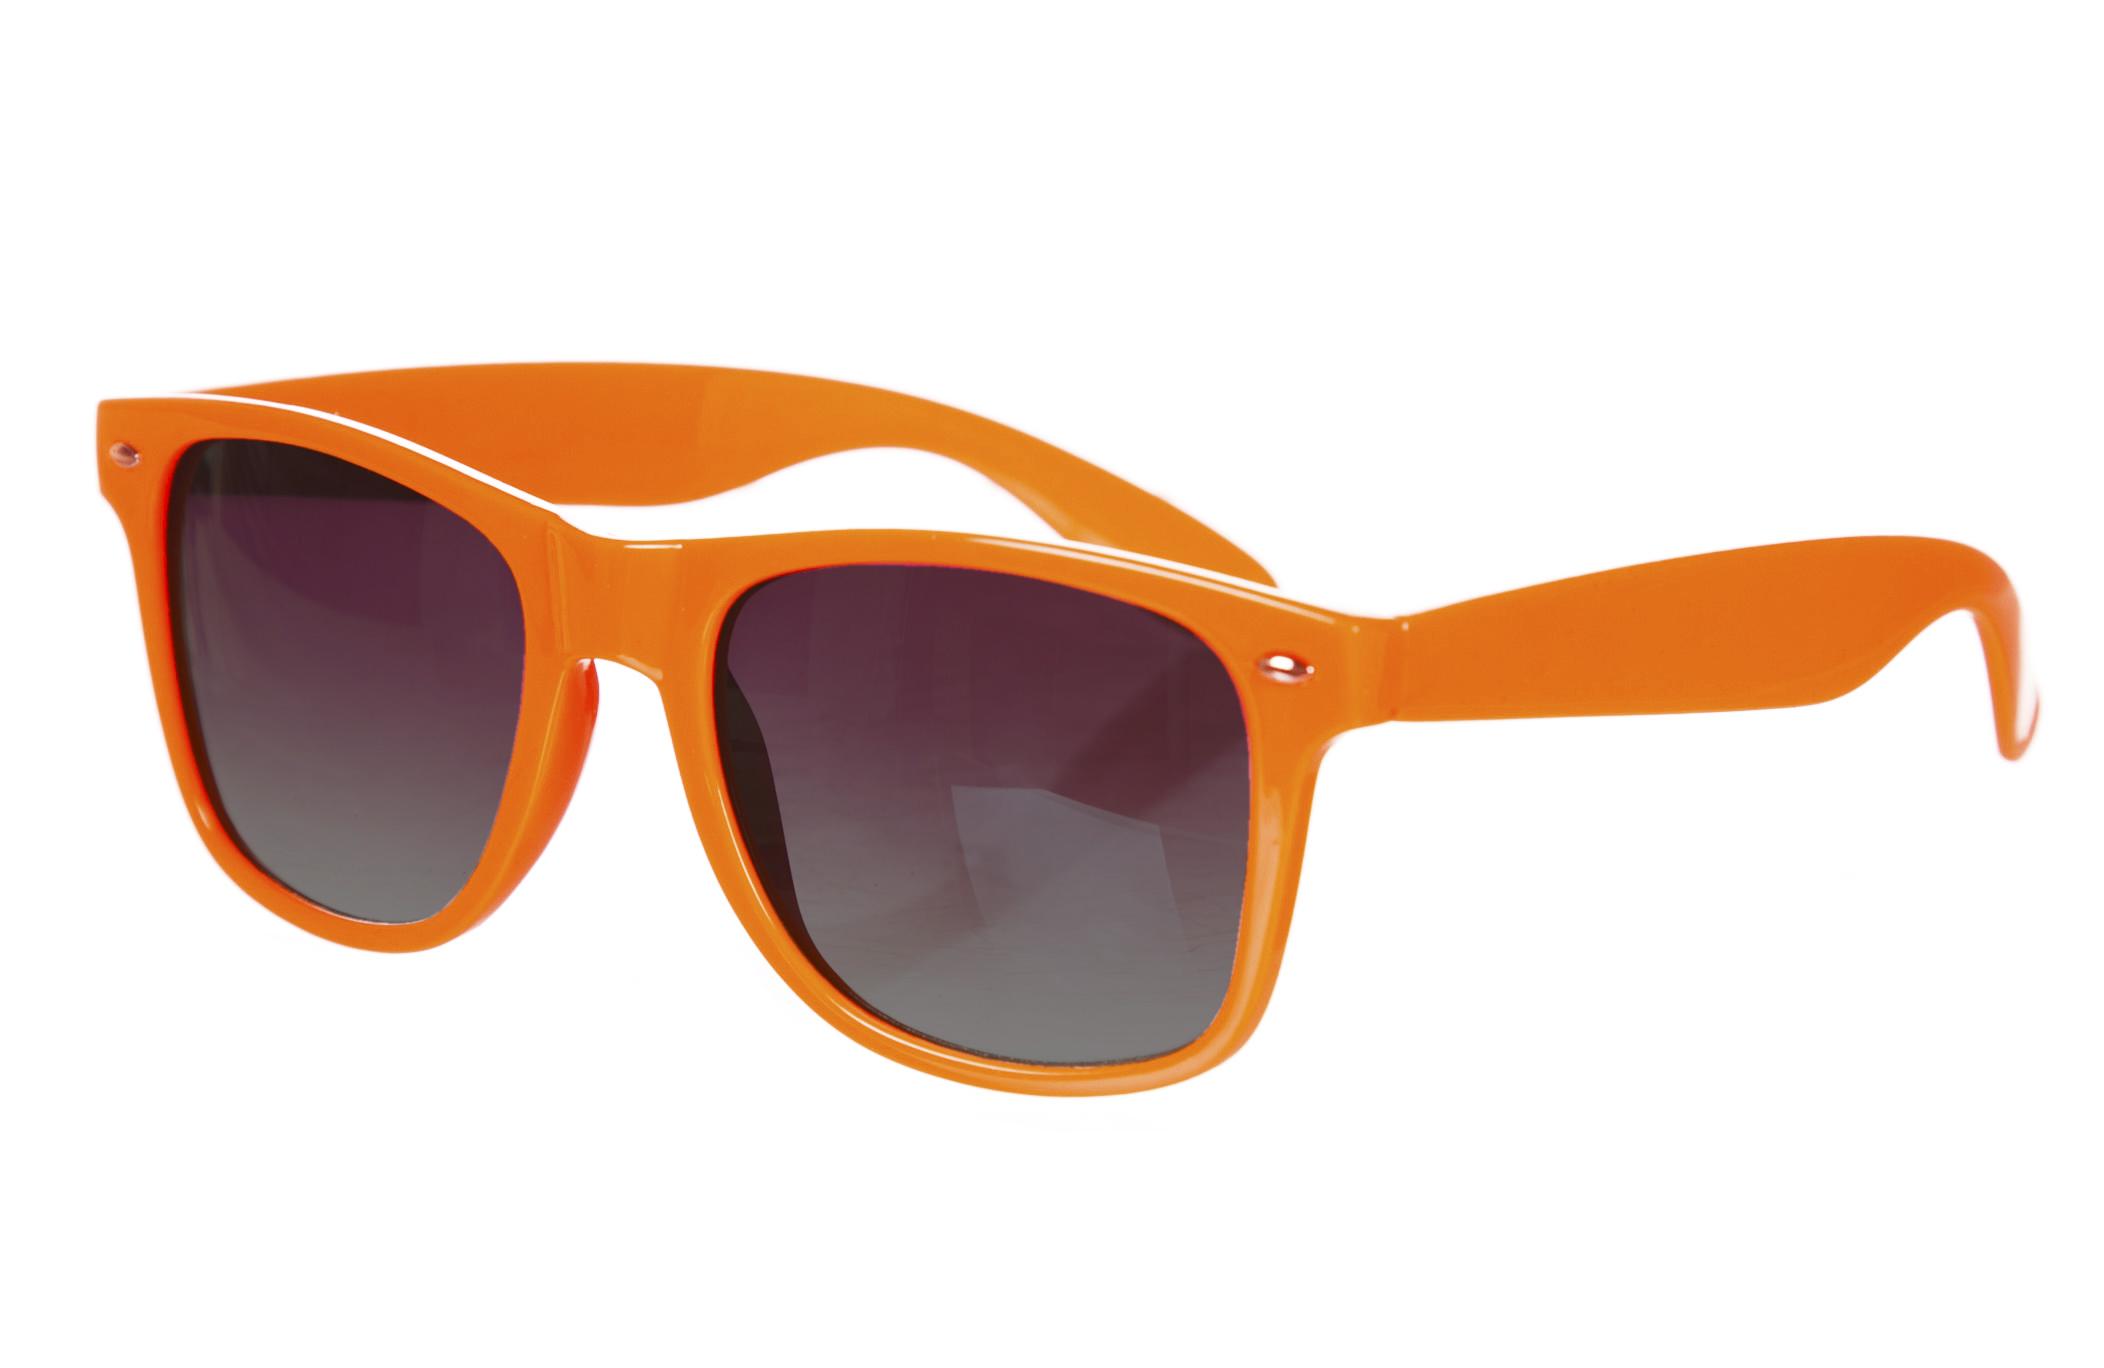 Goggles clipart cartoon. Free bright sunglasses cliparts